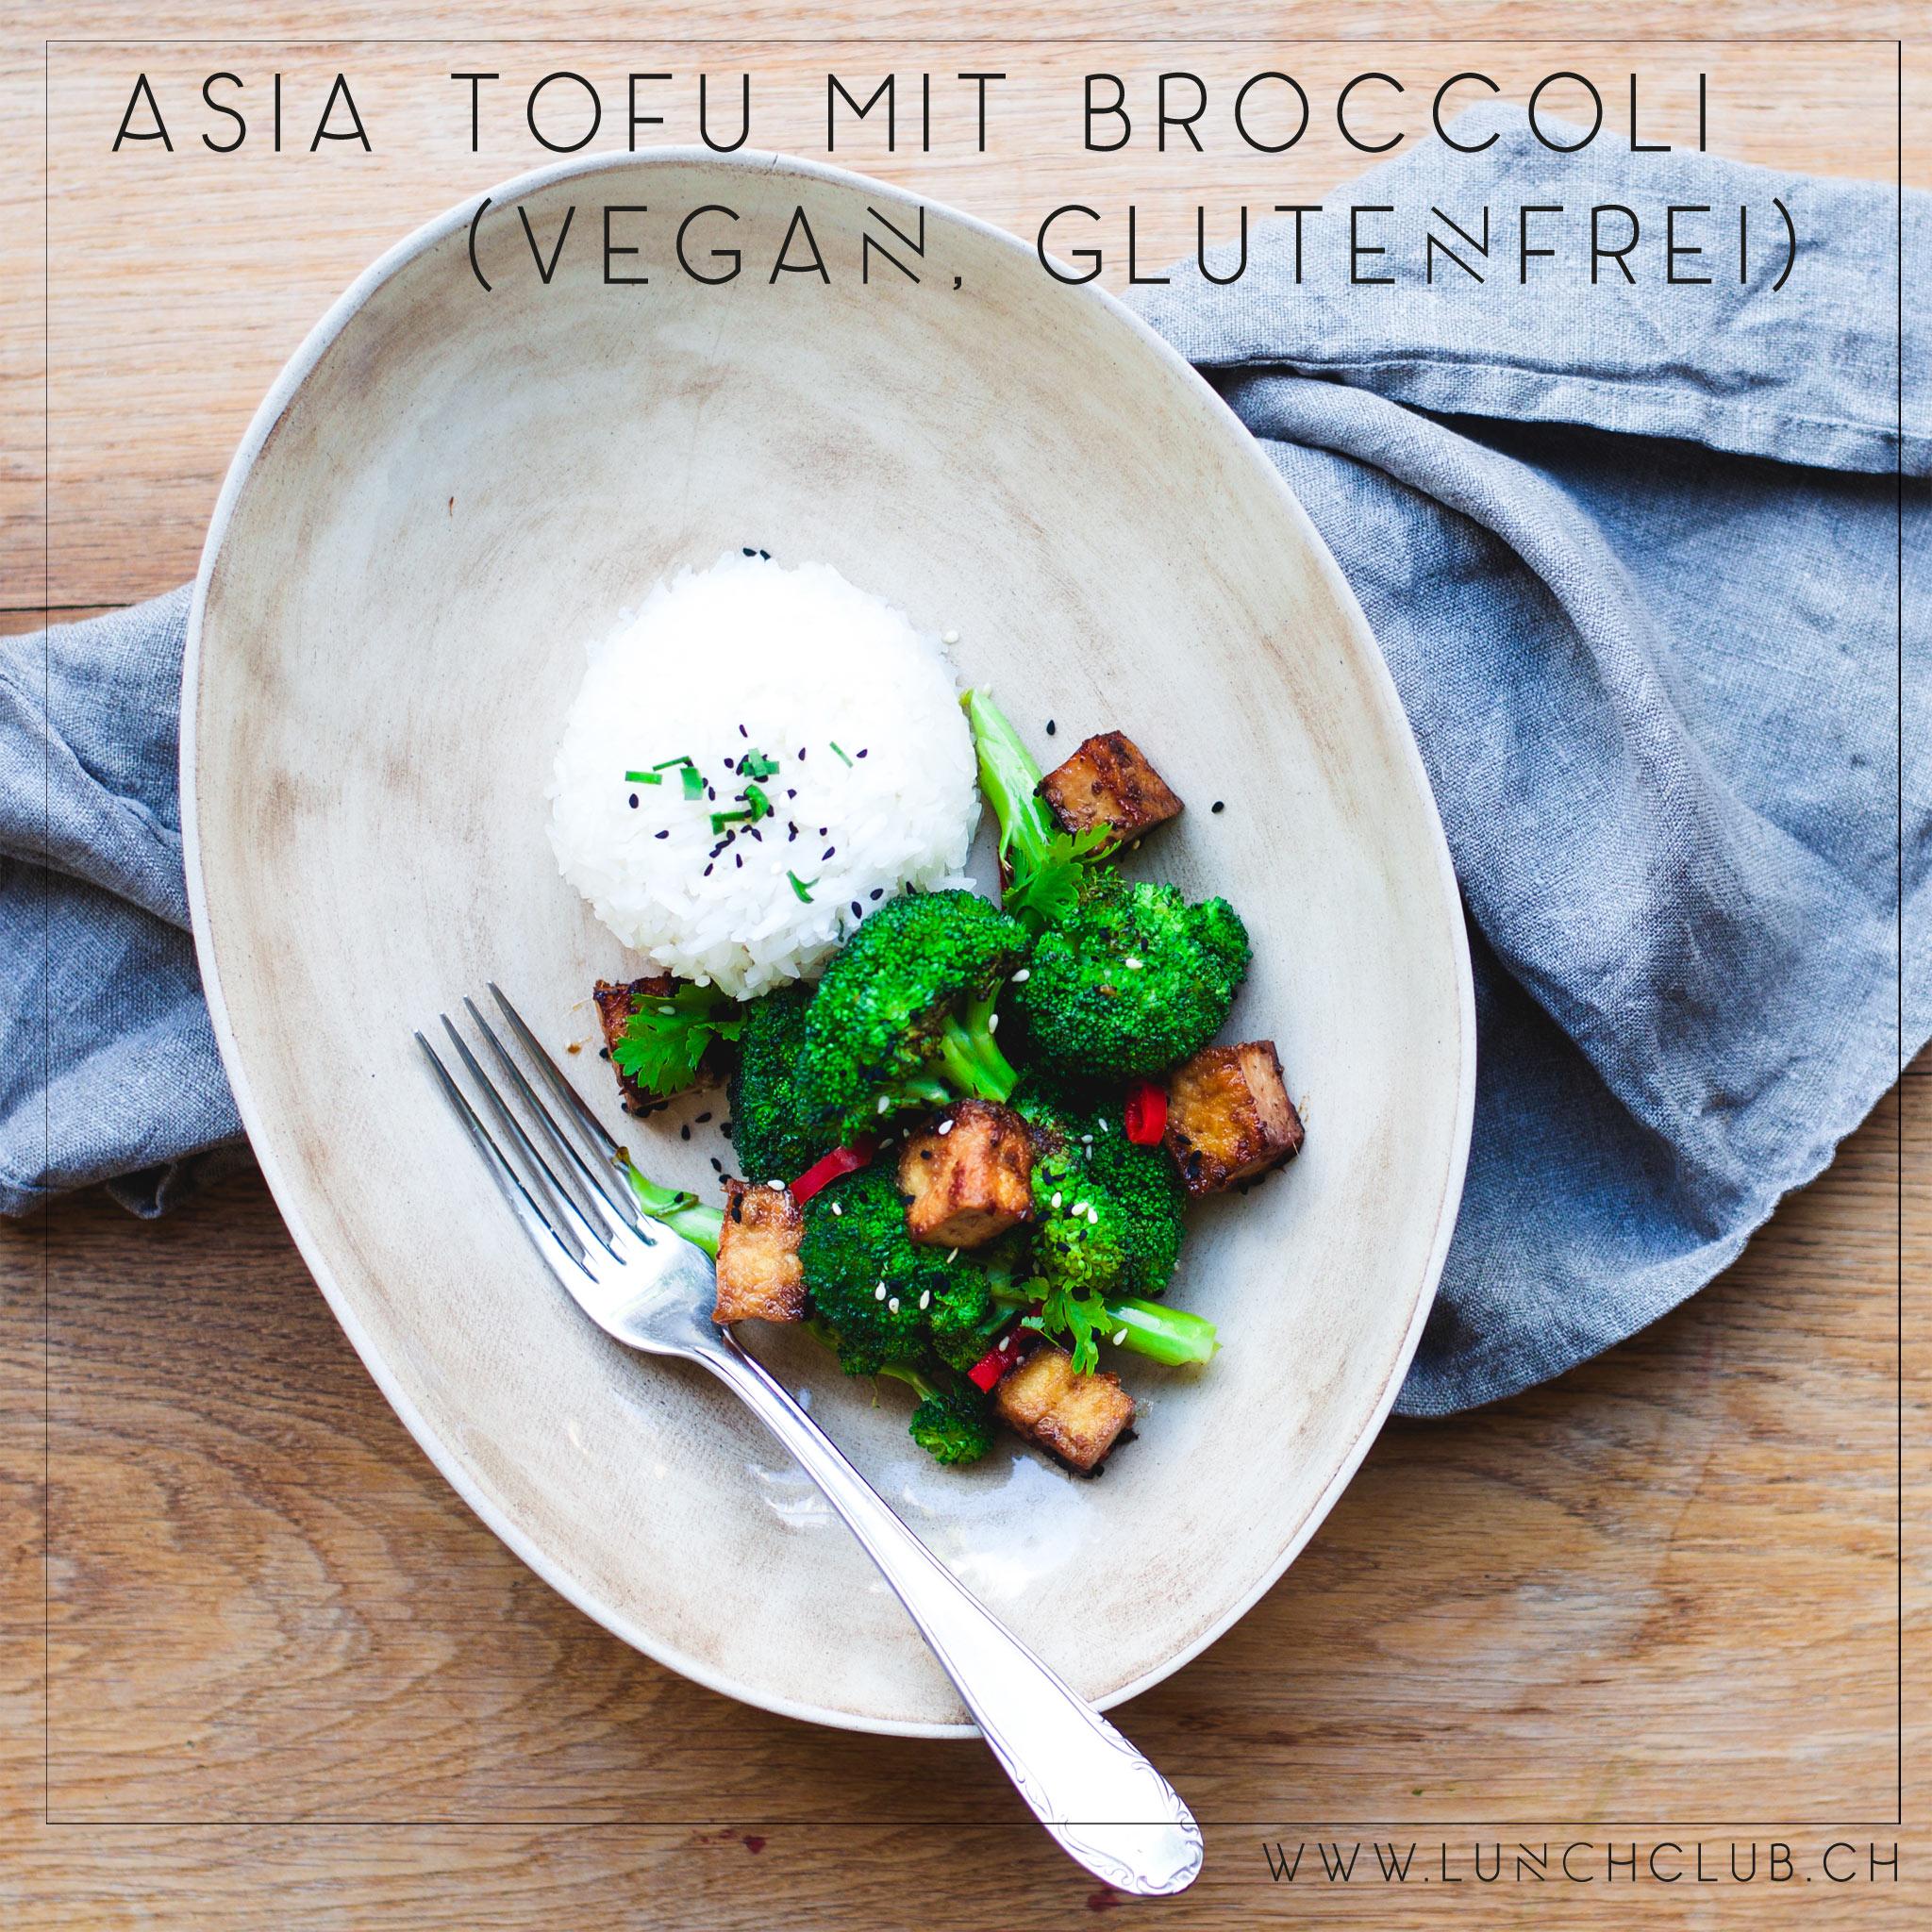 Asia-Tofu-mit-Broccoli.jpg